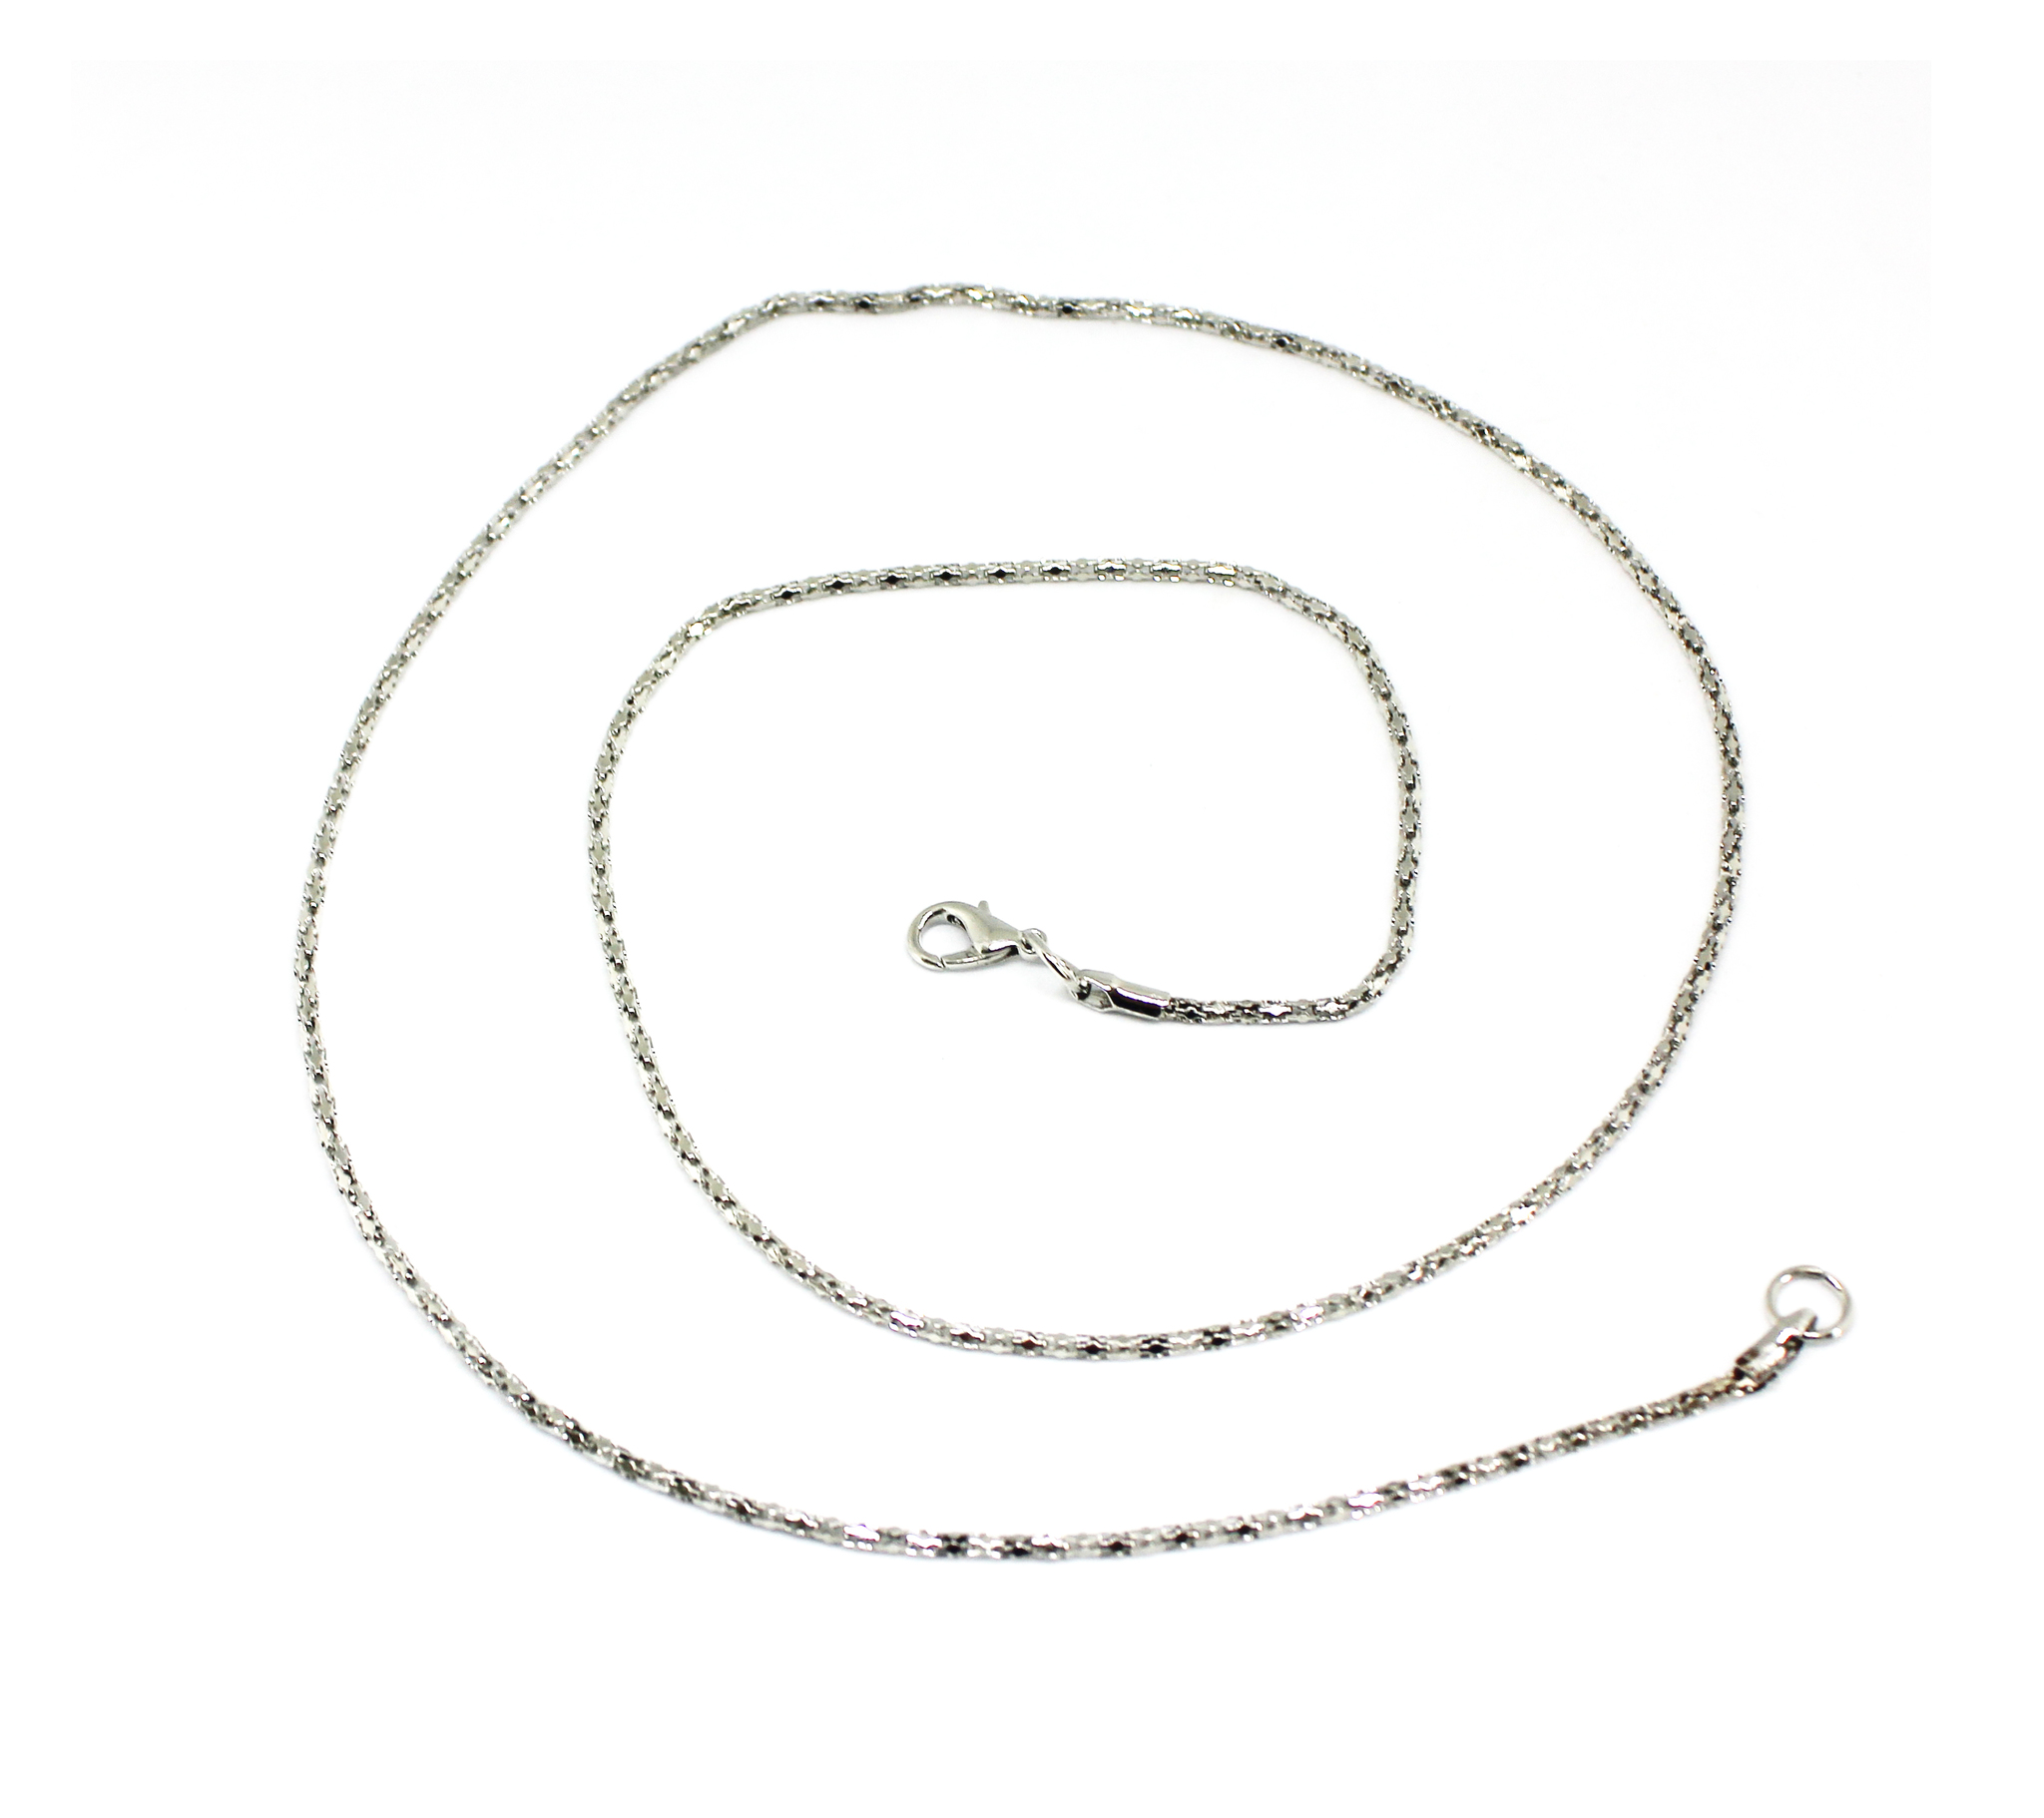 цепочка фигурная серебро